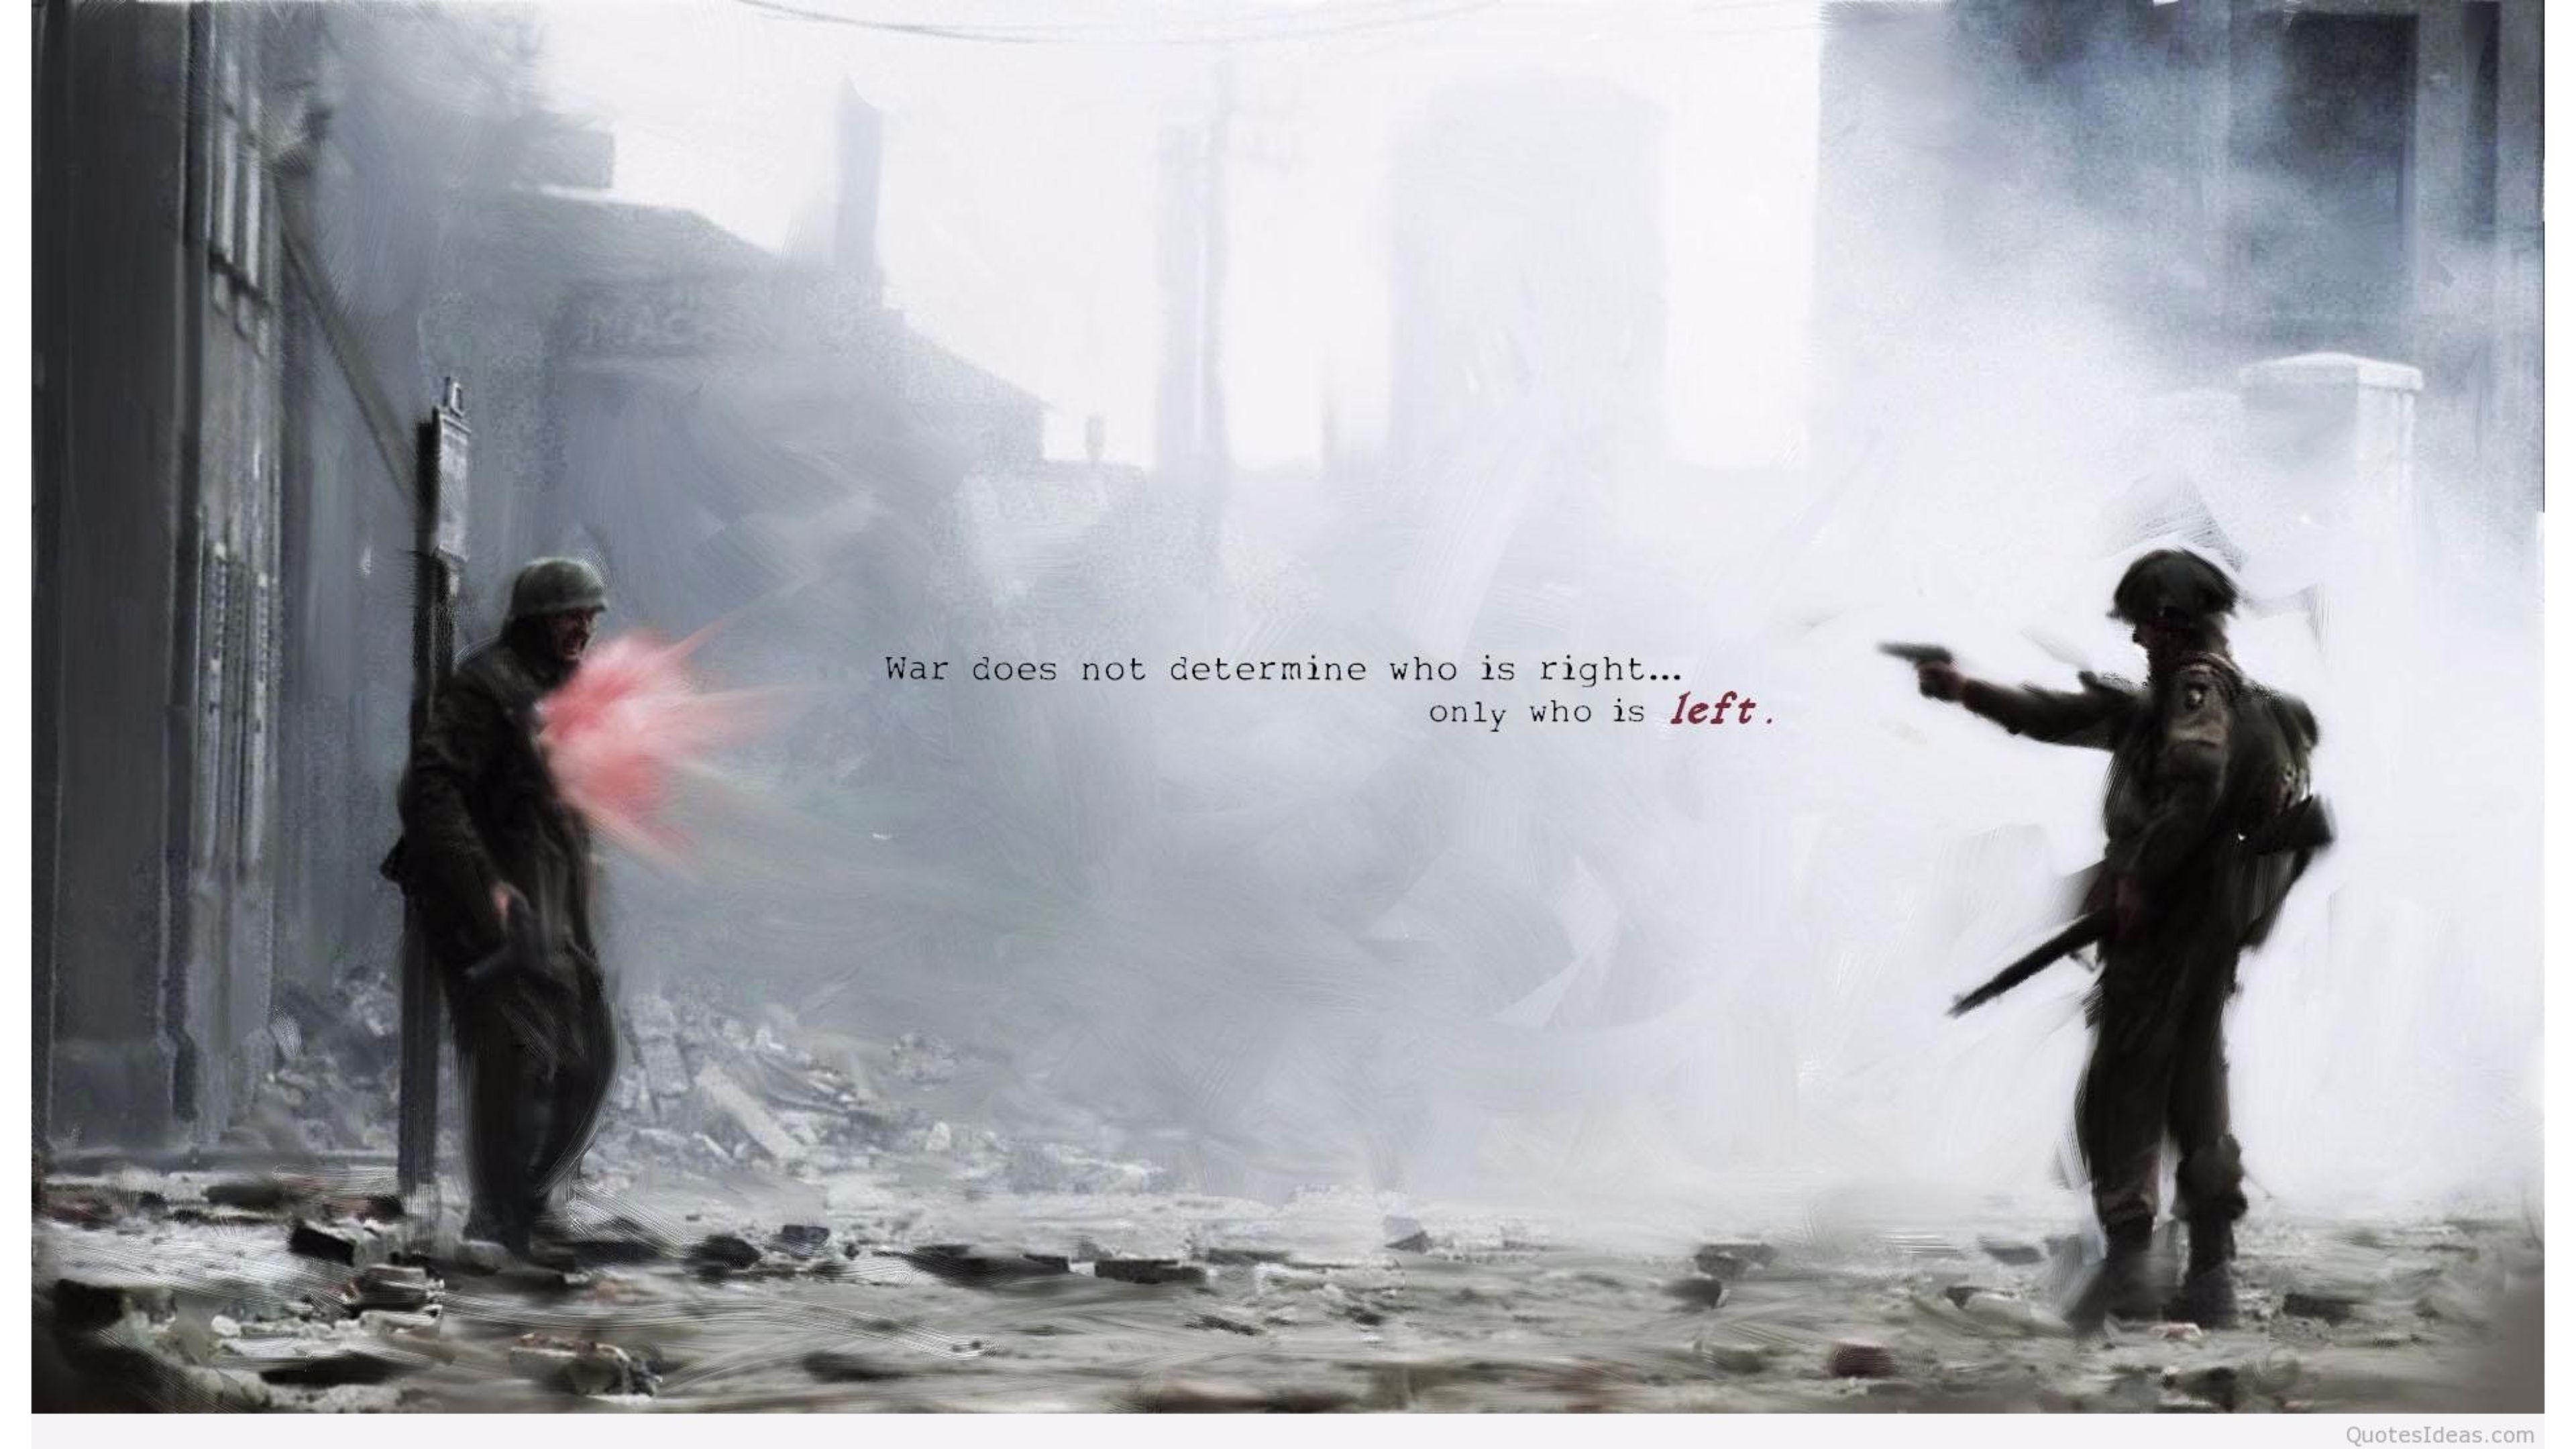 True Inspirational Quote 4K wallpaper